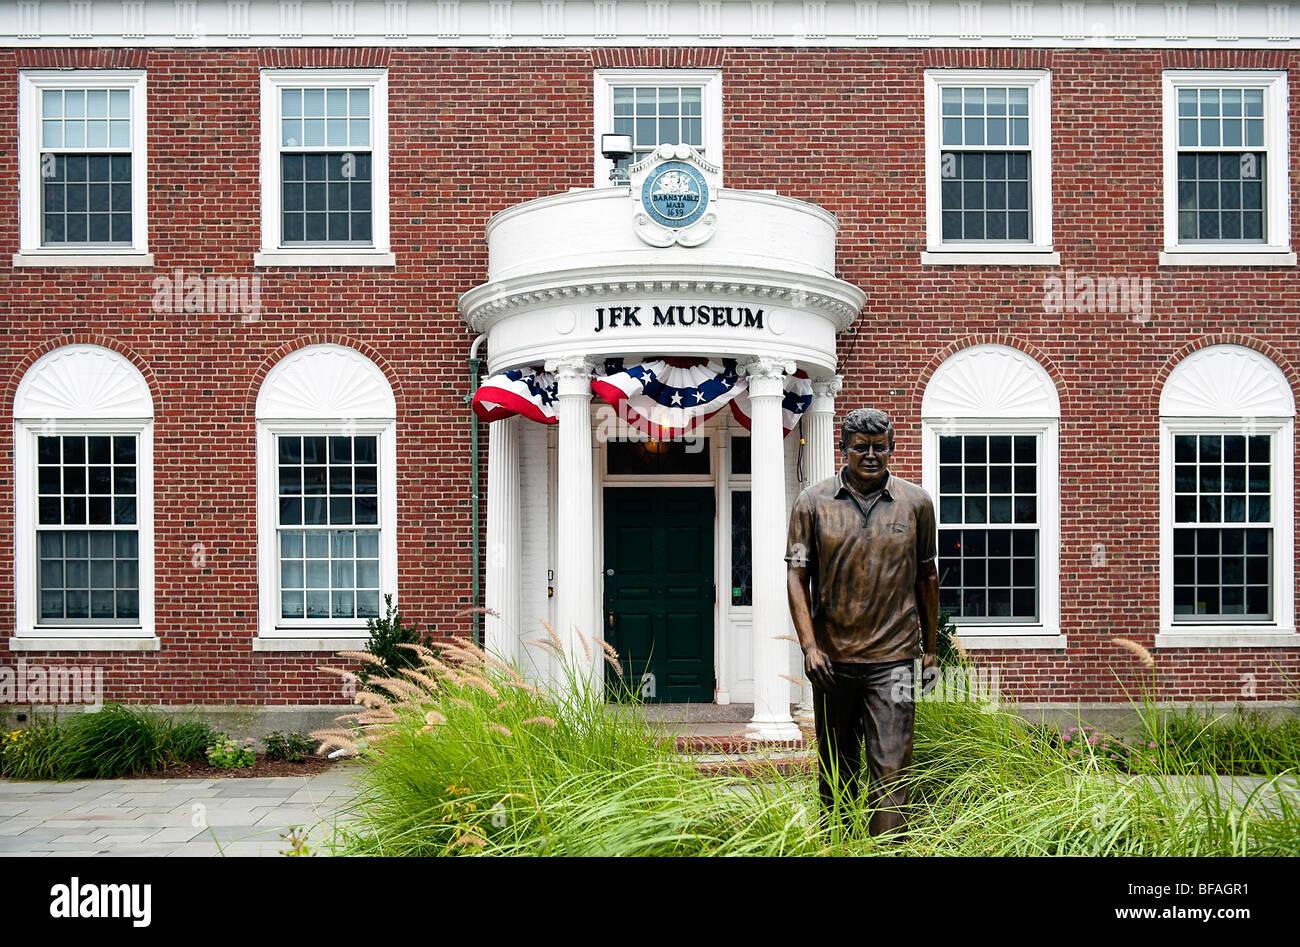 Exterior of the JFK Museum, Hyannis, Cape Cod, Massachusetts, USA - Stock Image